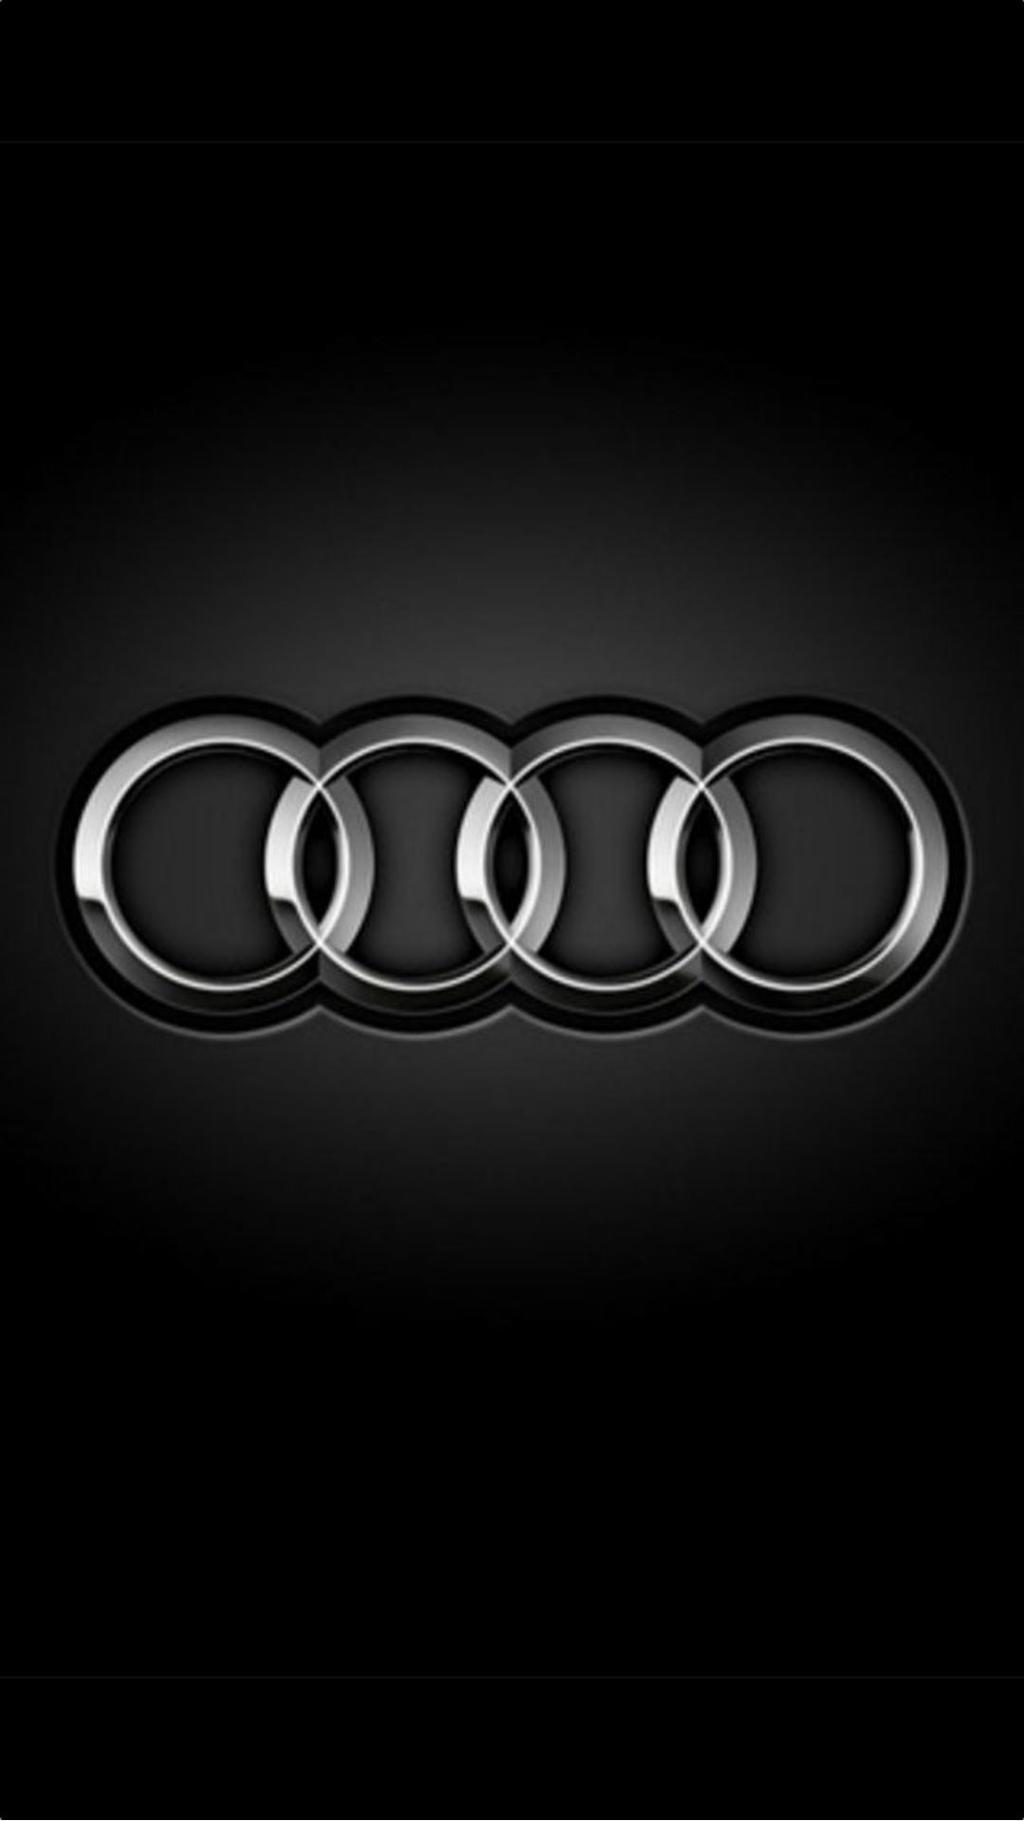 Audi Car Logo Iphone 6 Plus Hd Wallpaper By Angelk3215 On